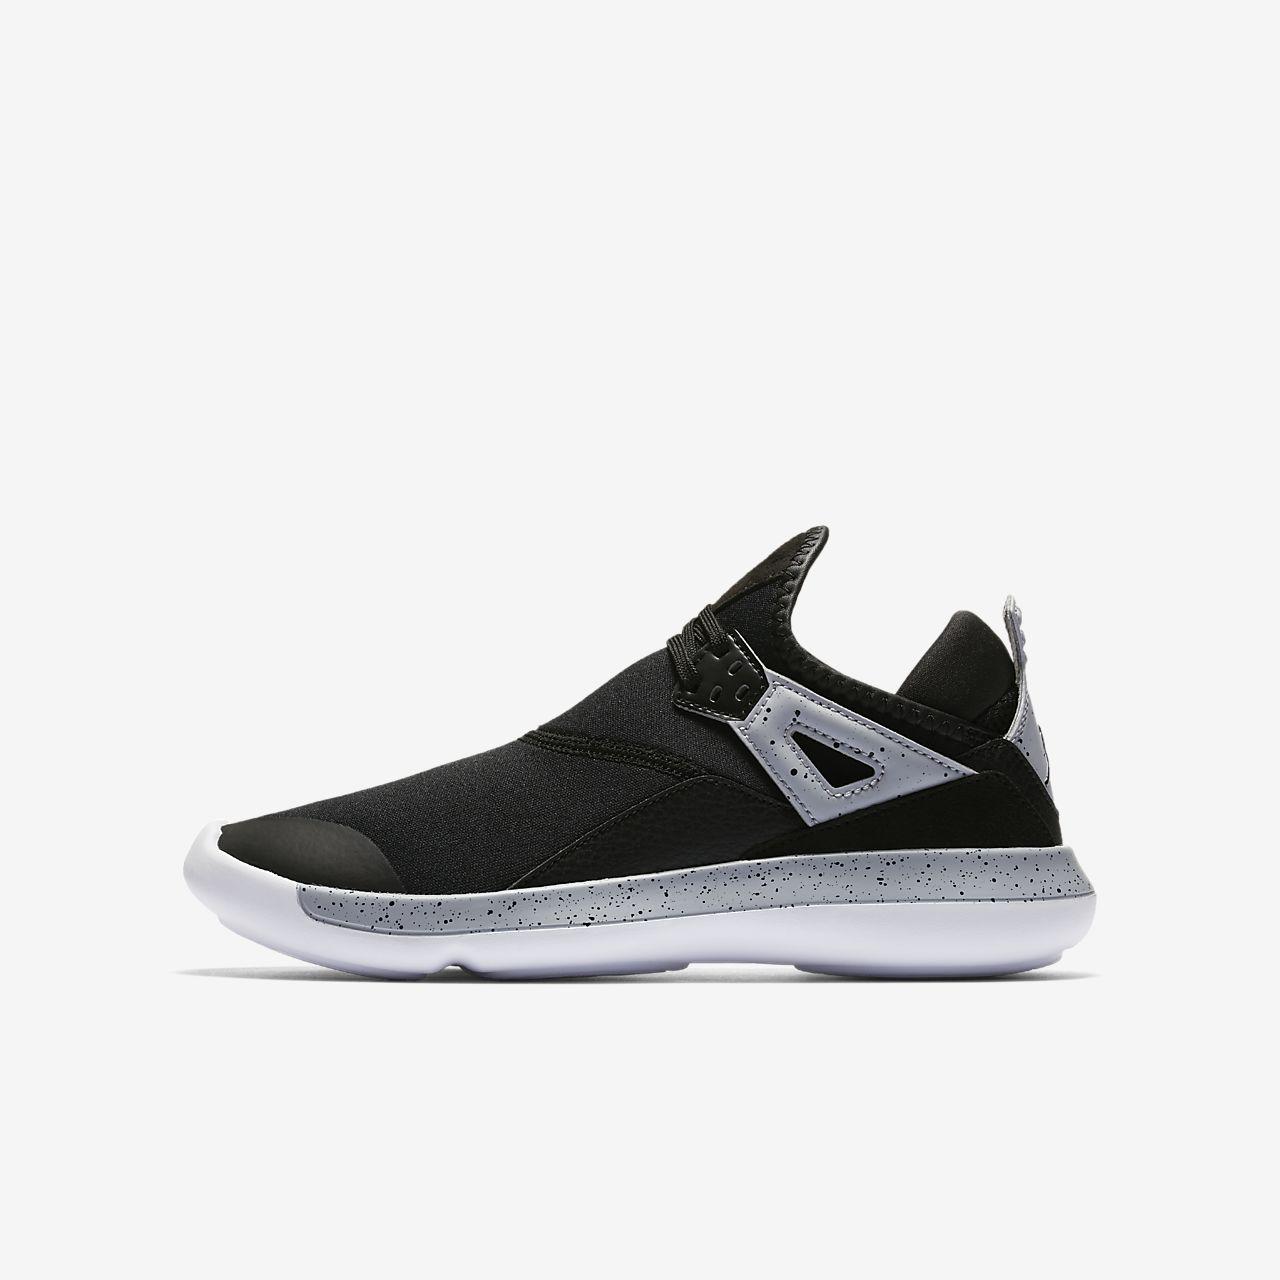 Nike Jordan 89 Fly 89 Jordan Scarpe da Ginnastica Uomo d48e97